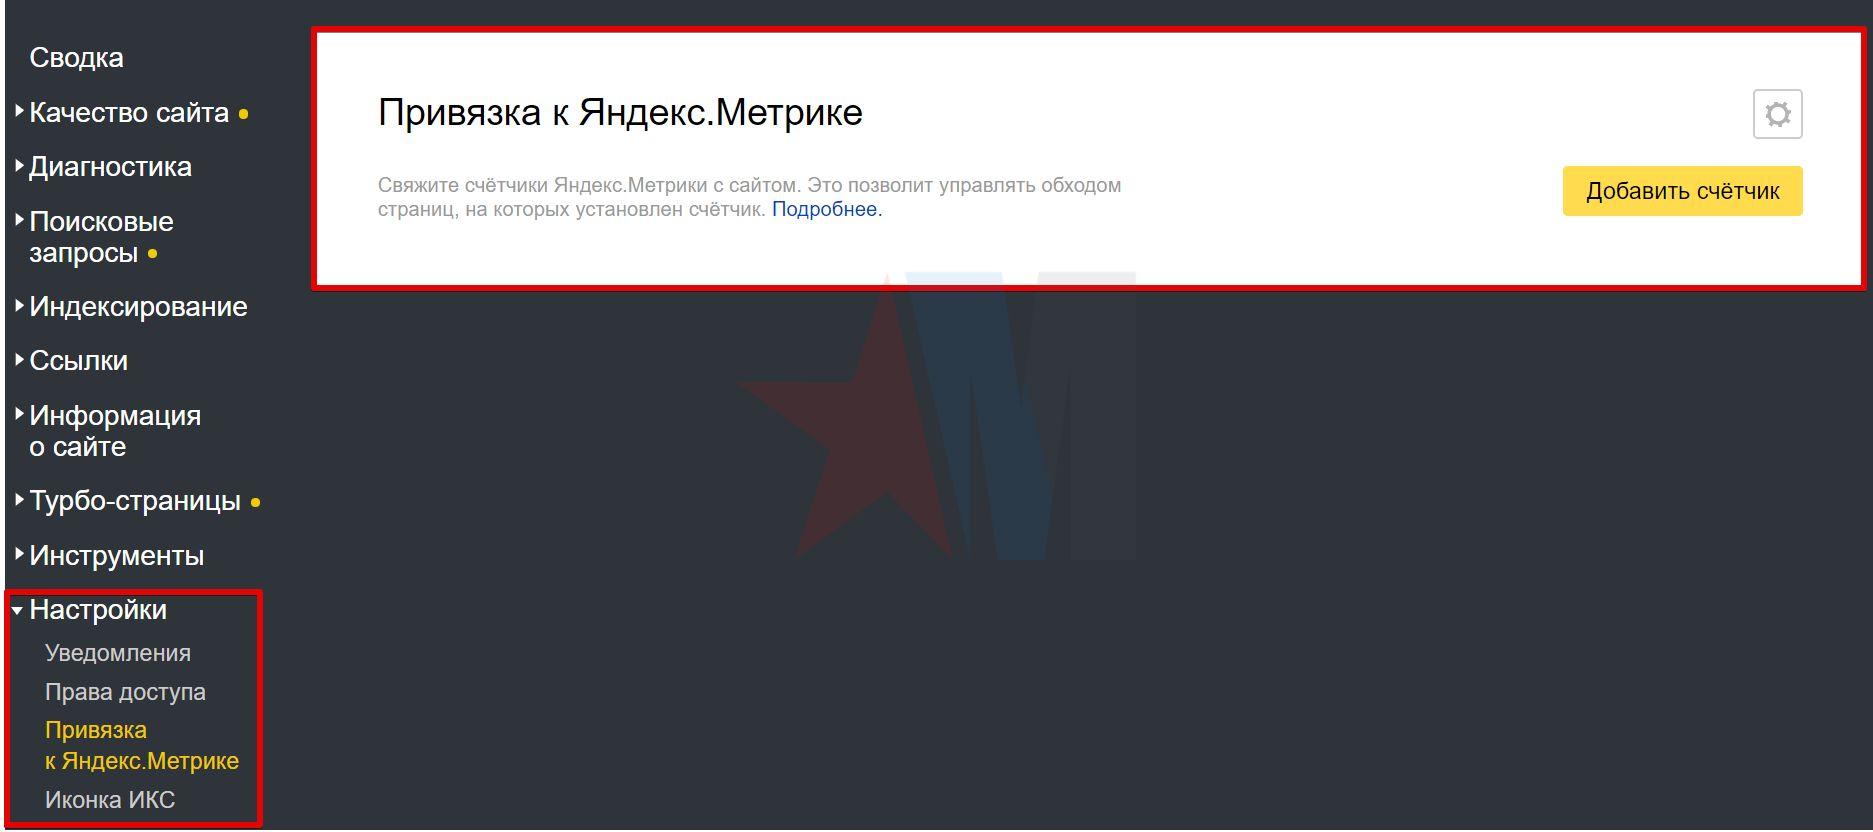 Привязка к Яндекс.Метрике в панели вебмастера